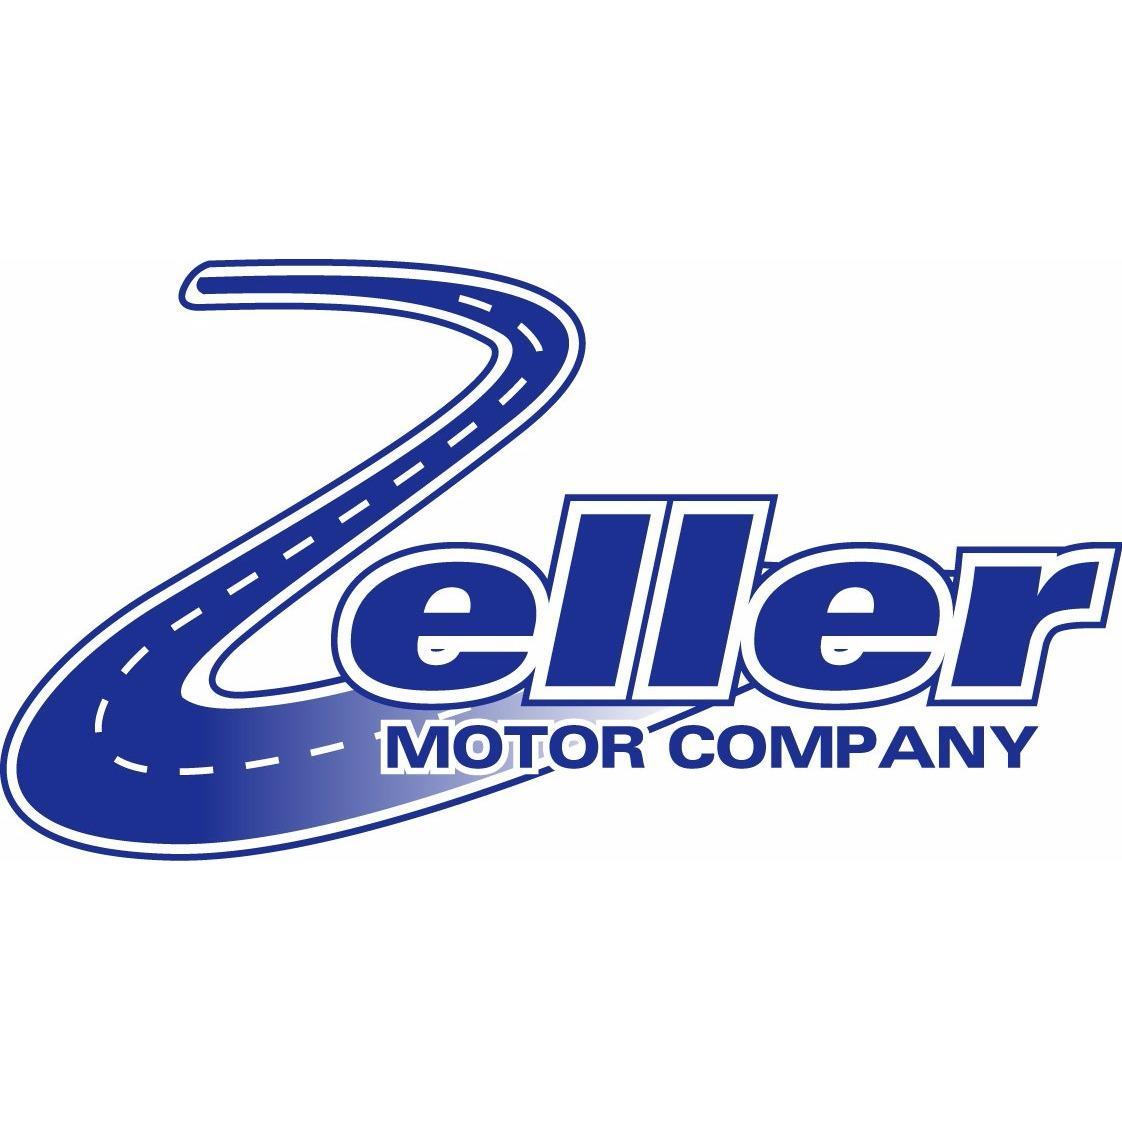 Zeller motor company coupons near me in arkansas city for Kansas dept of motor vehicles phone number